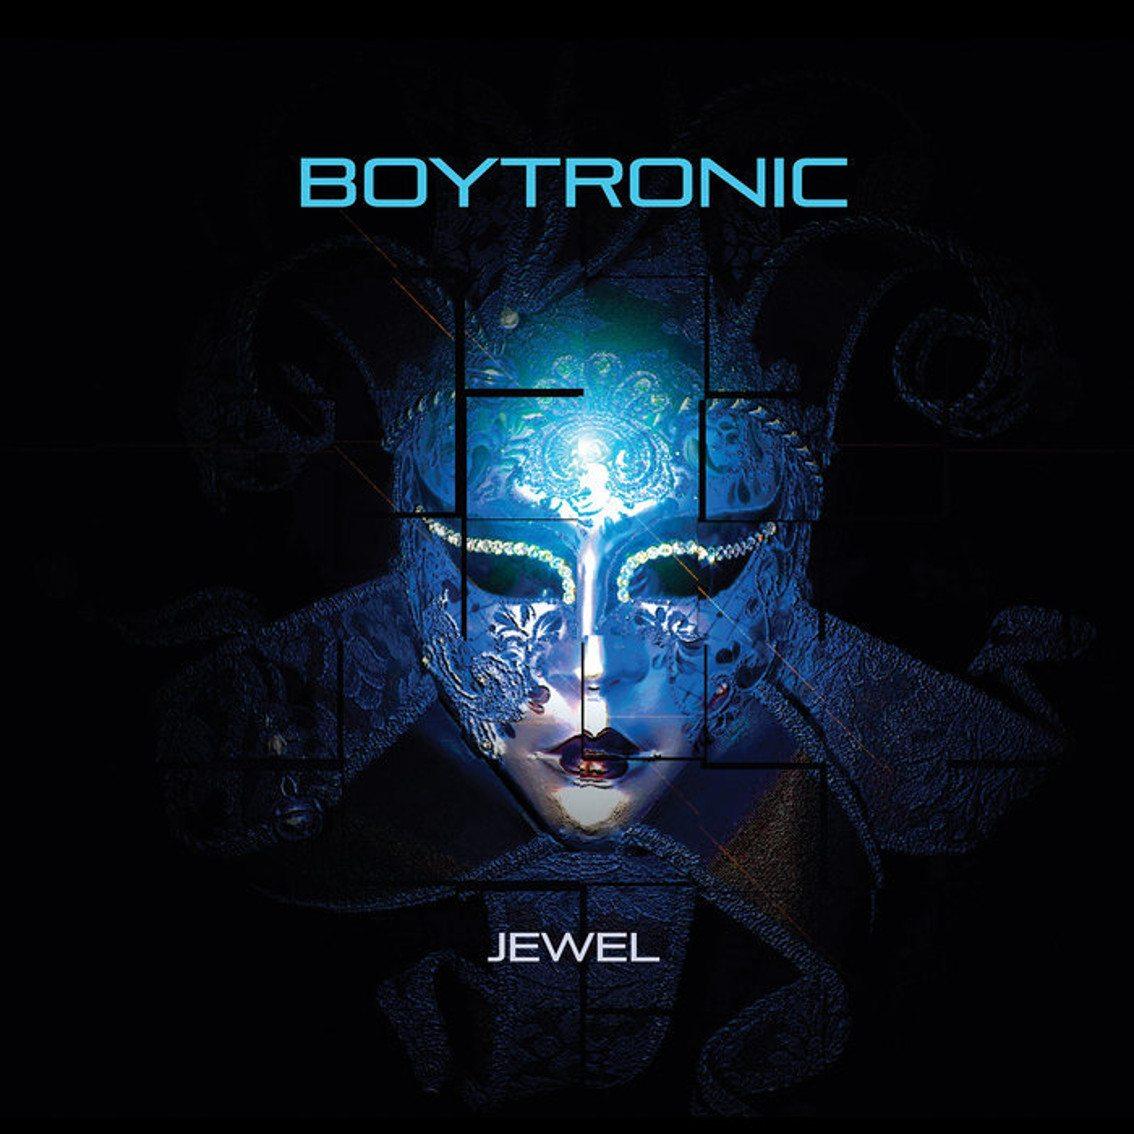 Boytronic prepare November release new album'Jewel'